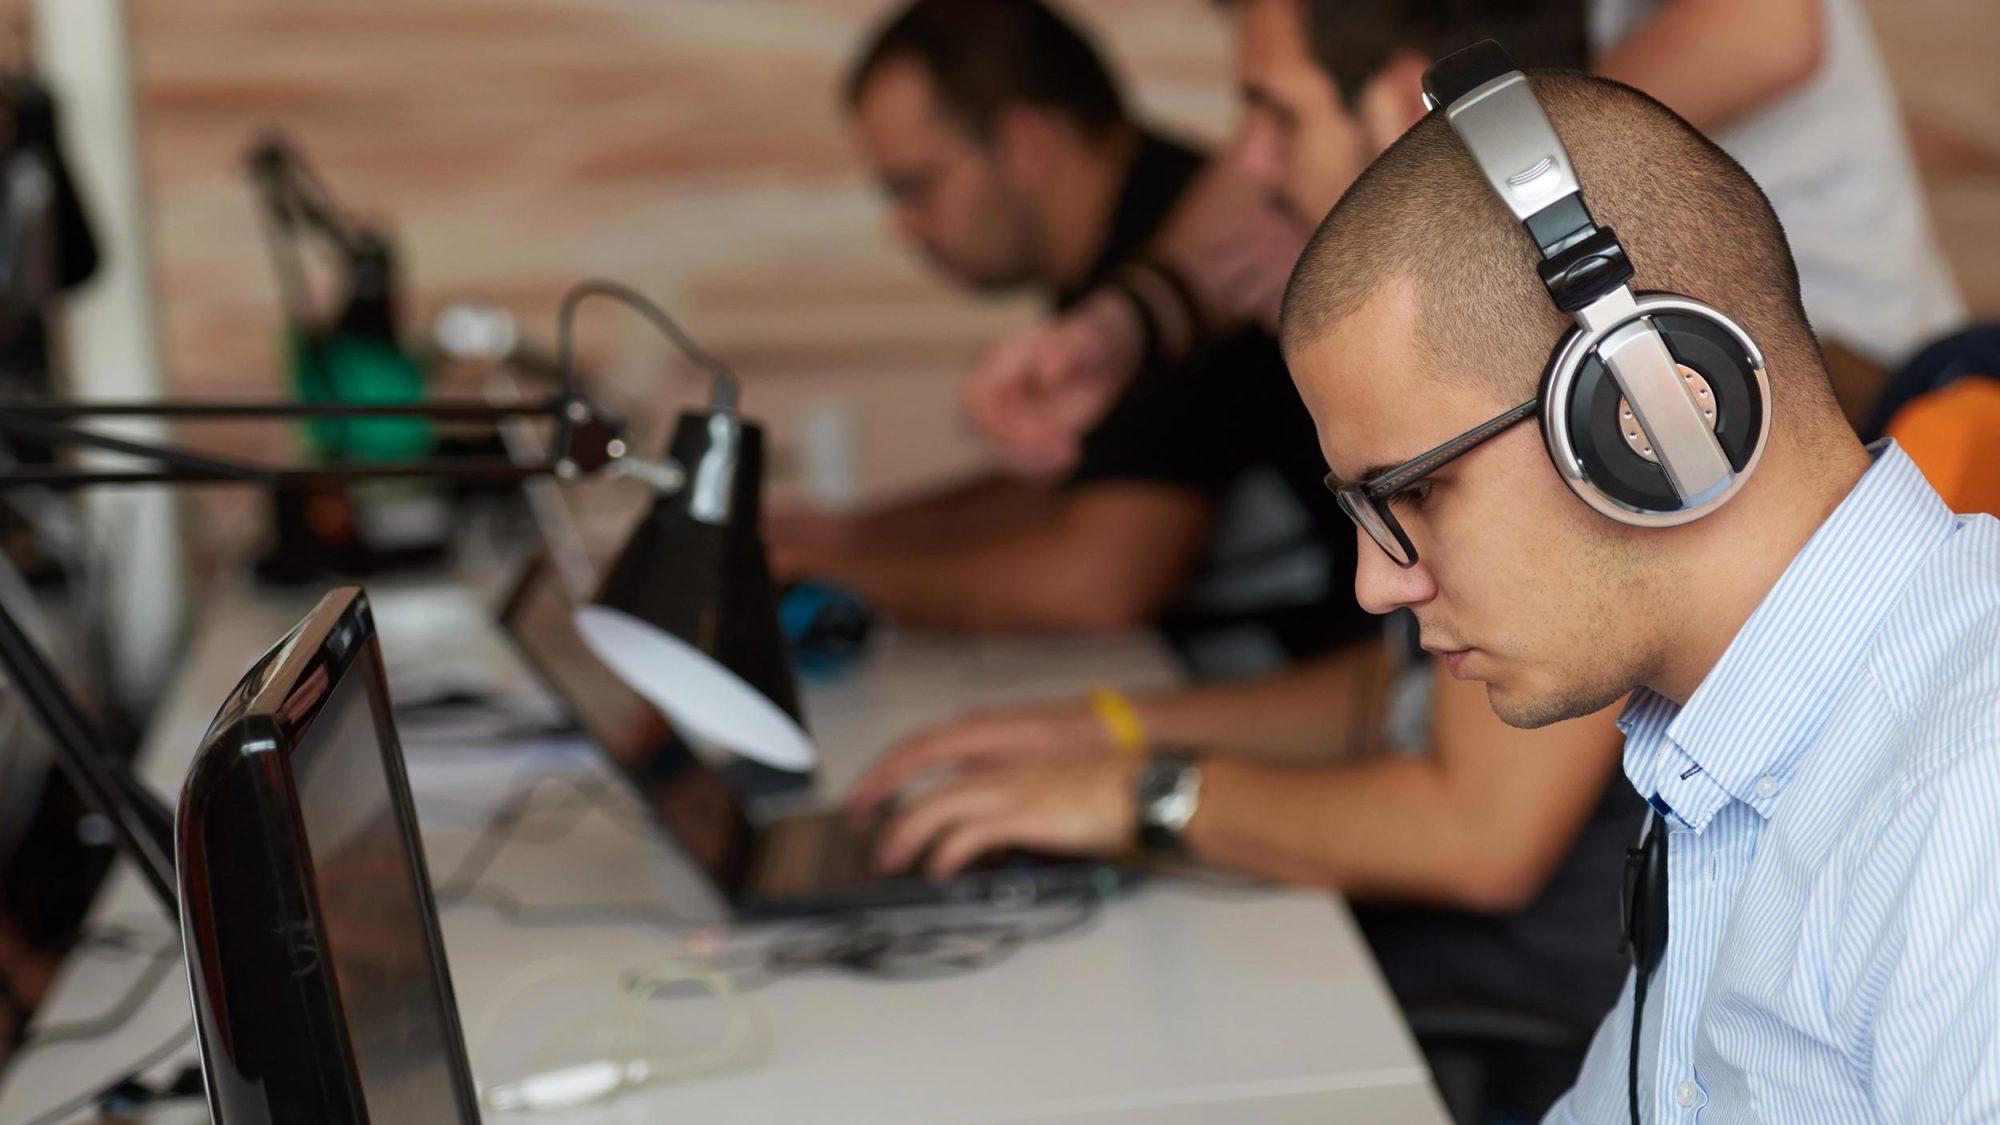 Junior Softwareentwickler